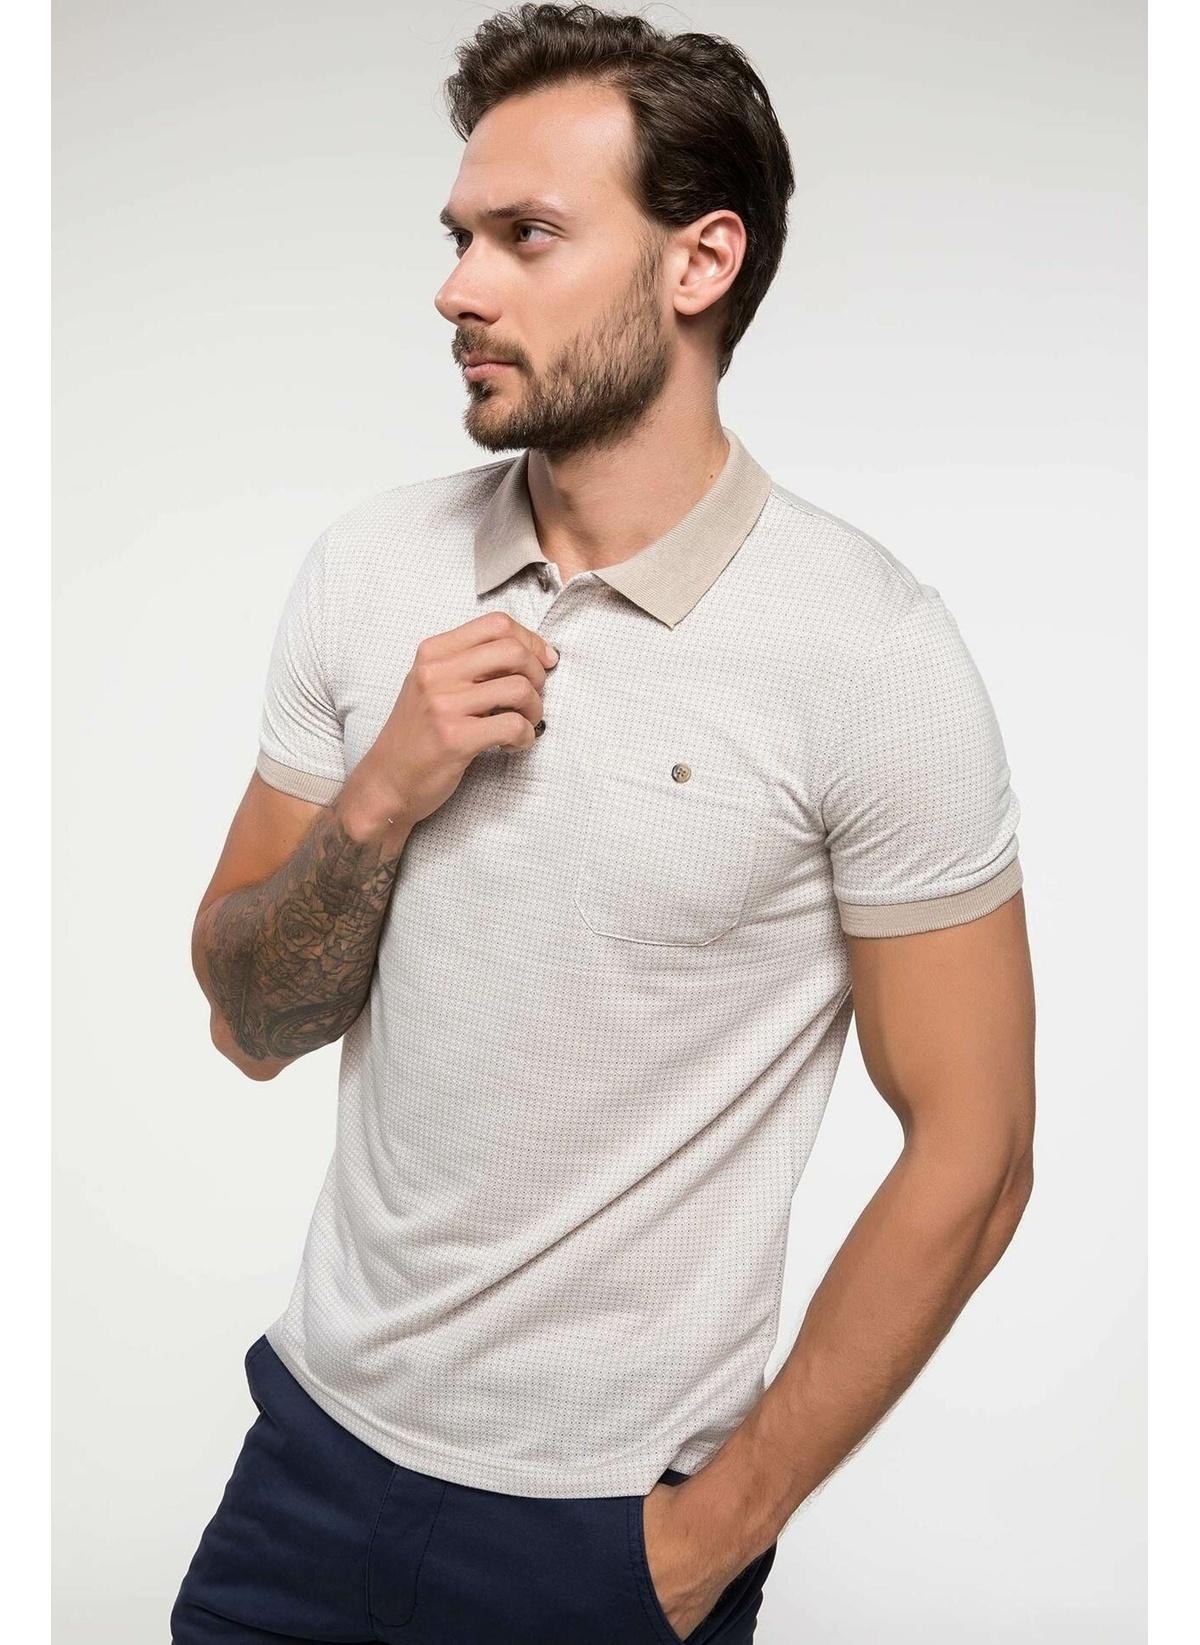 Defacto Geometrik Desenli Jakarlı Polo T-shirt J0444az18hsbg193t-shirt – 44.99 TL